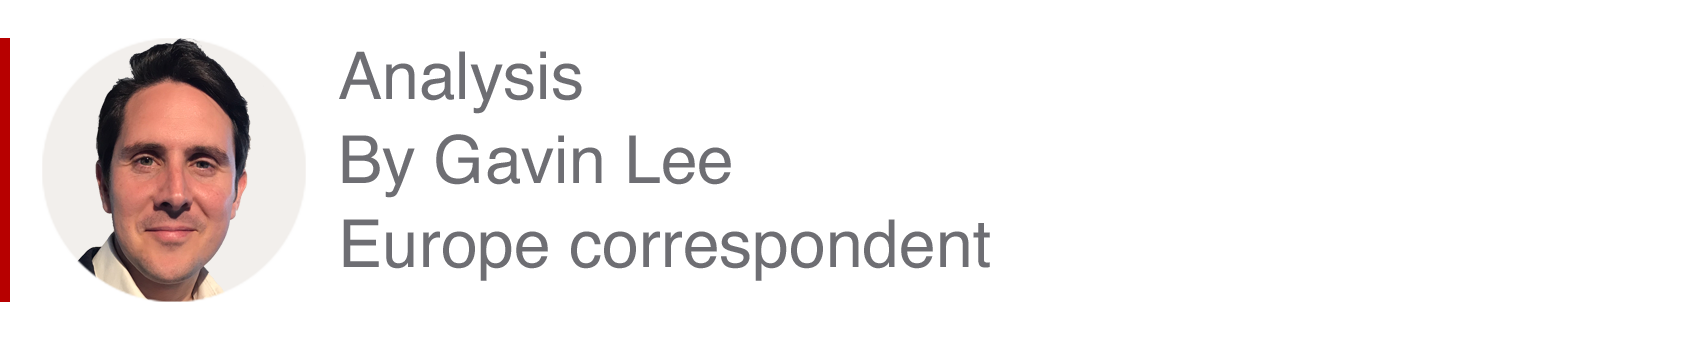 Analysis box by Gavin Lee, Europe correspondent